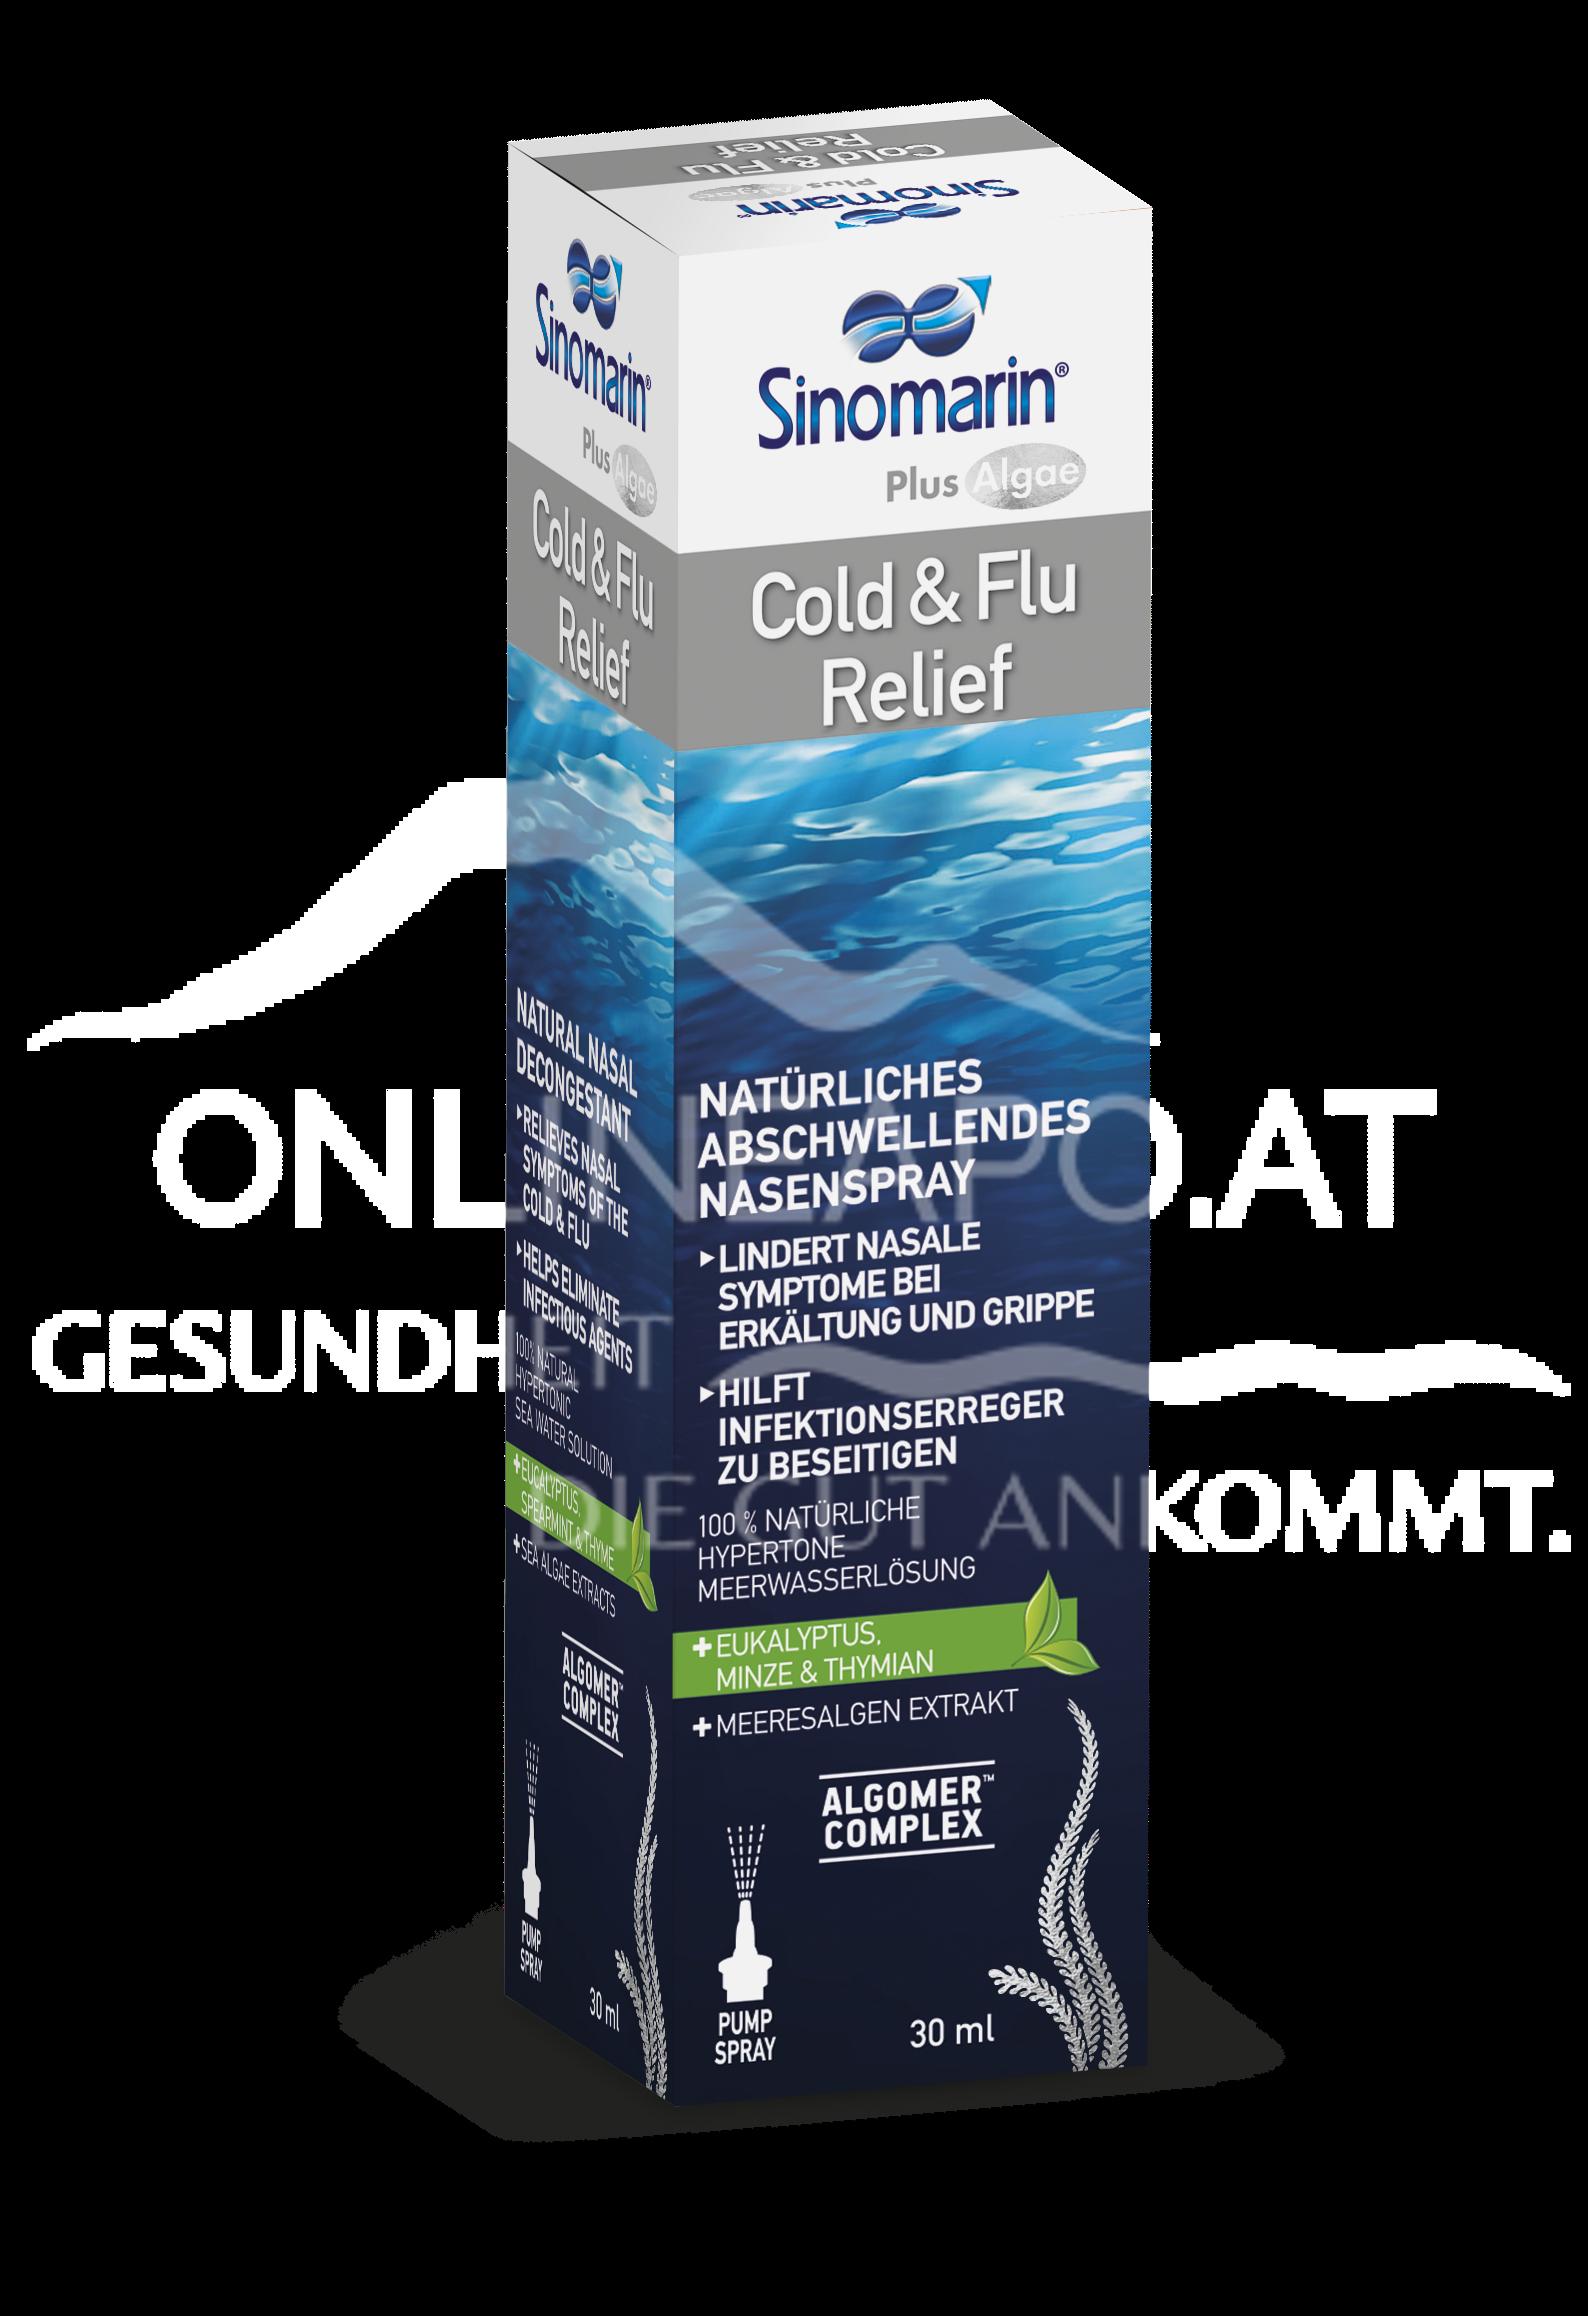 Sinomarin Cold & Flu Relief + Alge Nasenspray